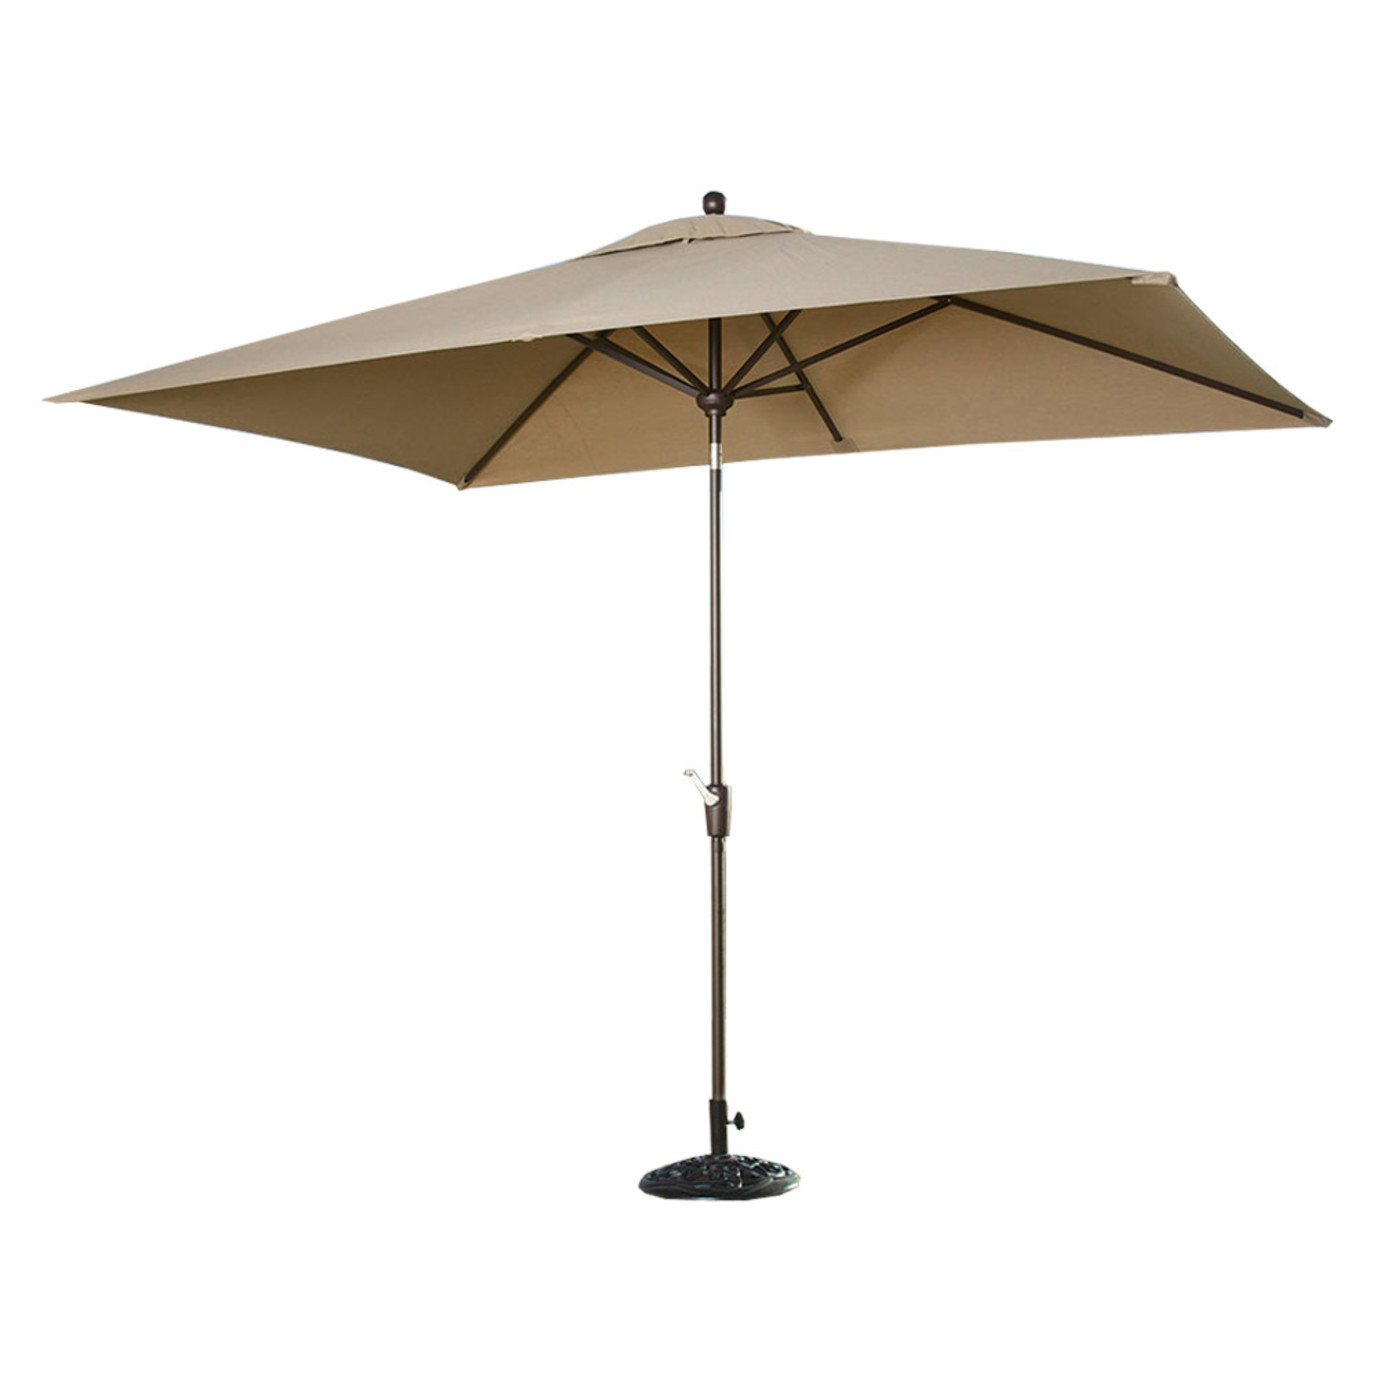 Portofino Comfort Auto Tilt Dining Umbrella Heather